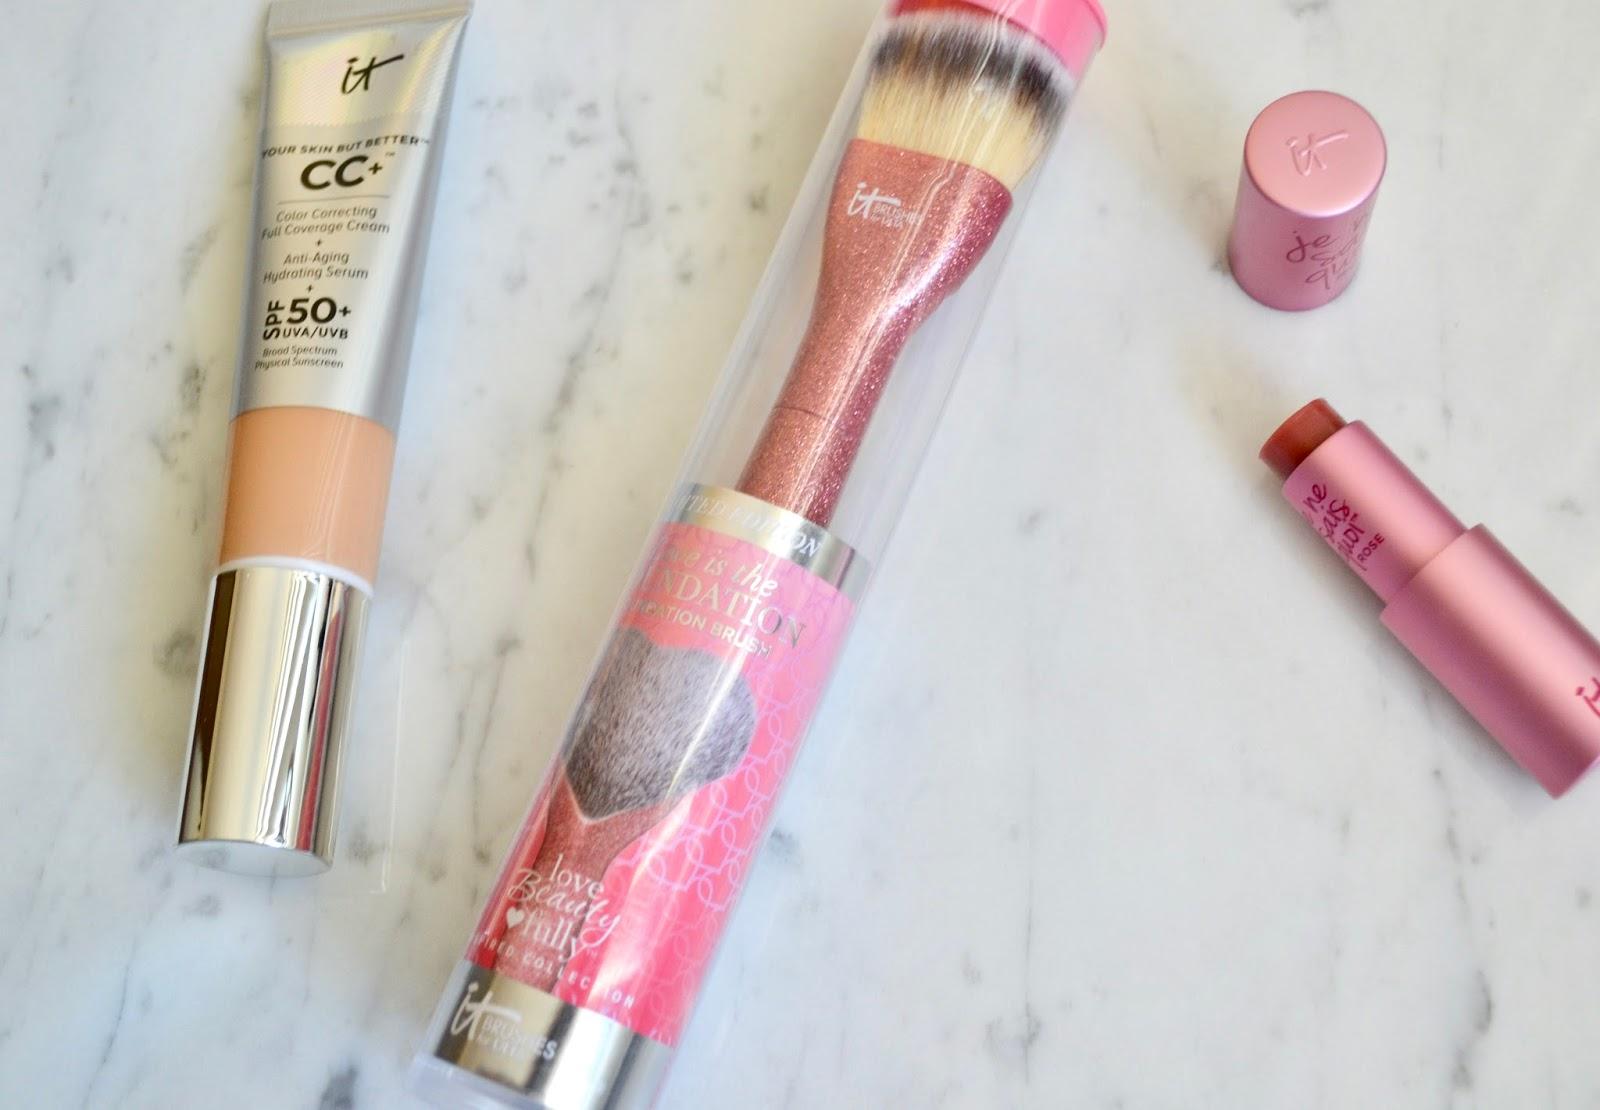 It Cosmetics x ULTA Love Beauty Fully All Over Powder Brush #211 by IT Cosmetics #6